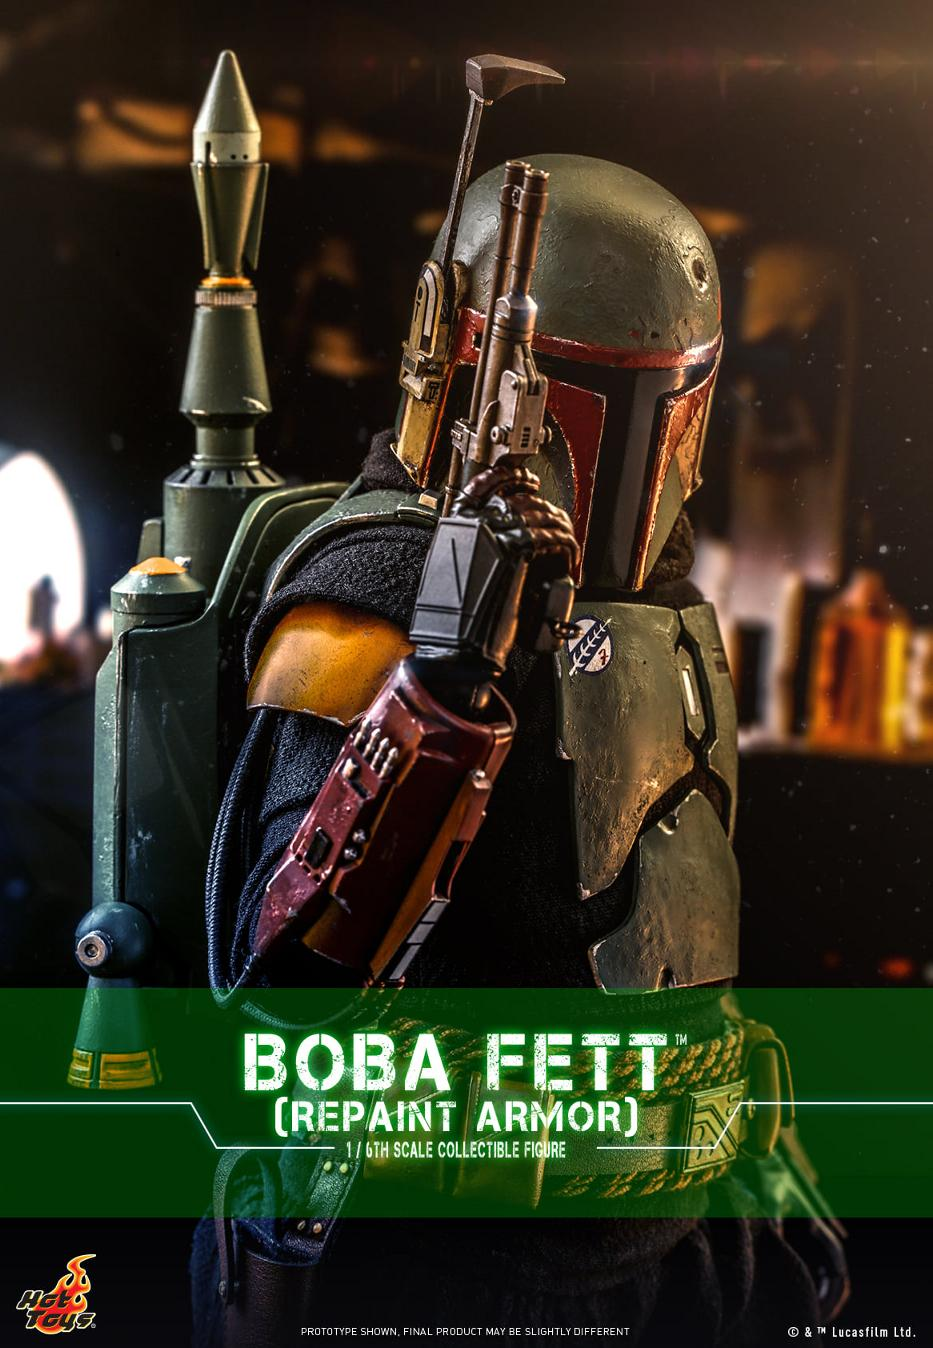 Boba Fett (Repaint Armor) Collectible Figure - Hot Toys Boba_f61